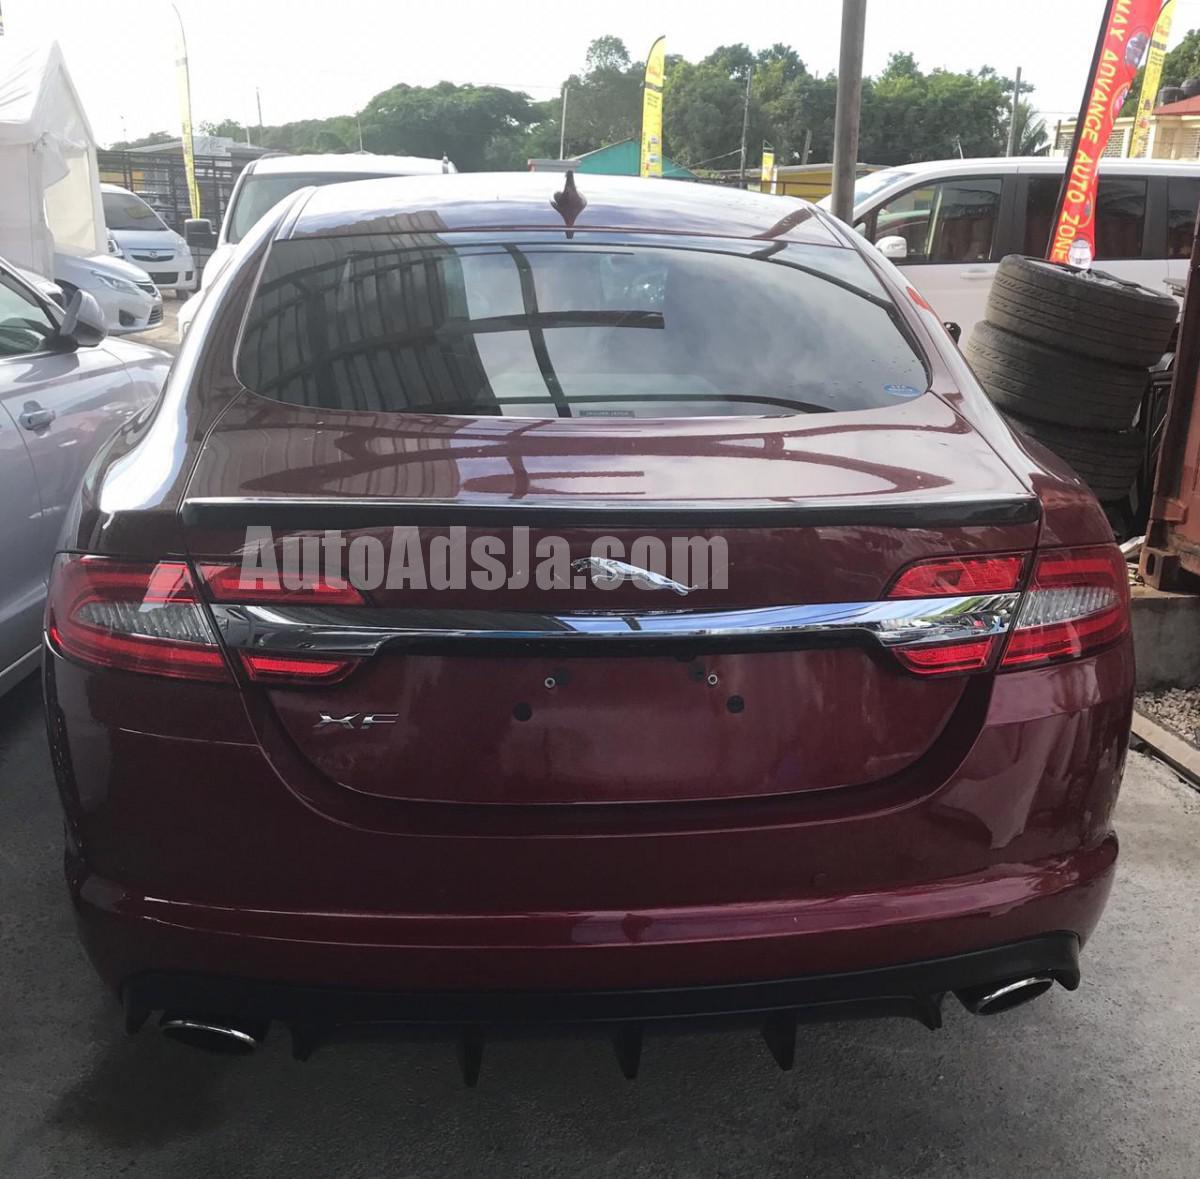 Xf Jaguar For Sale Used: 2013 Jaguar XF For Sale In St. Catherine, Jamaica